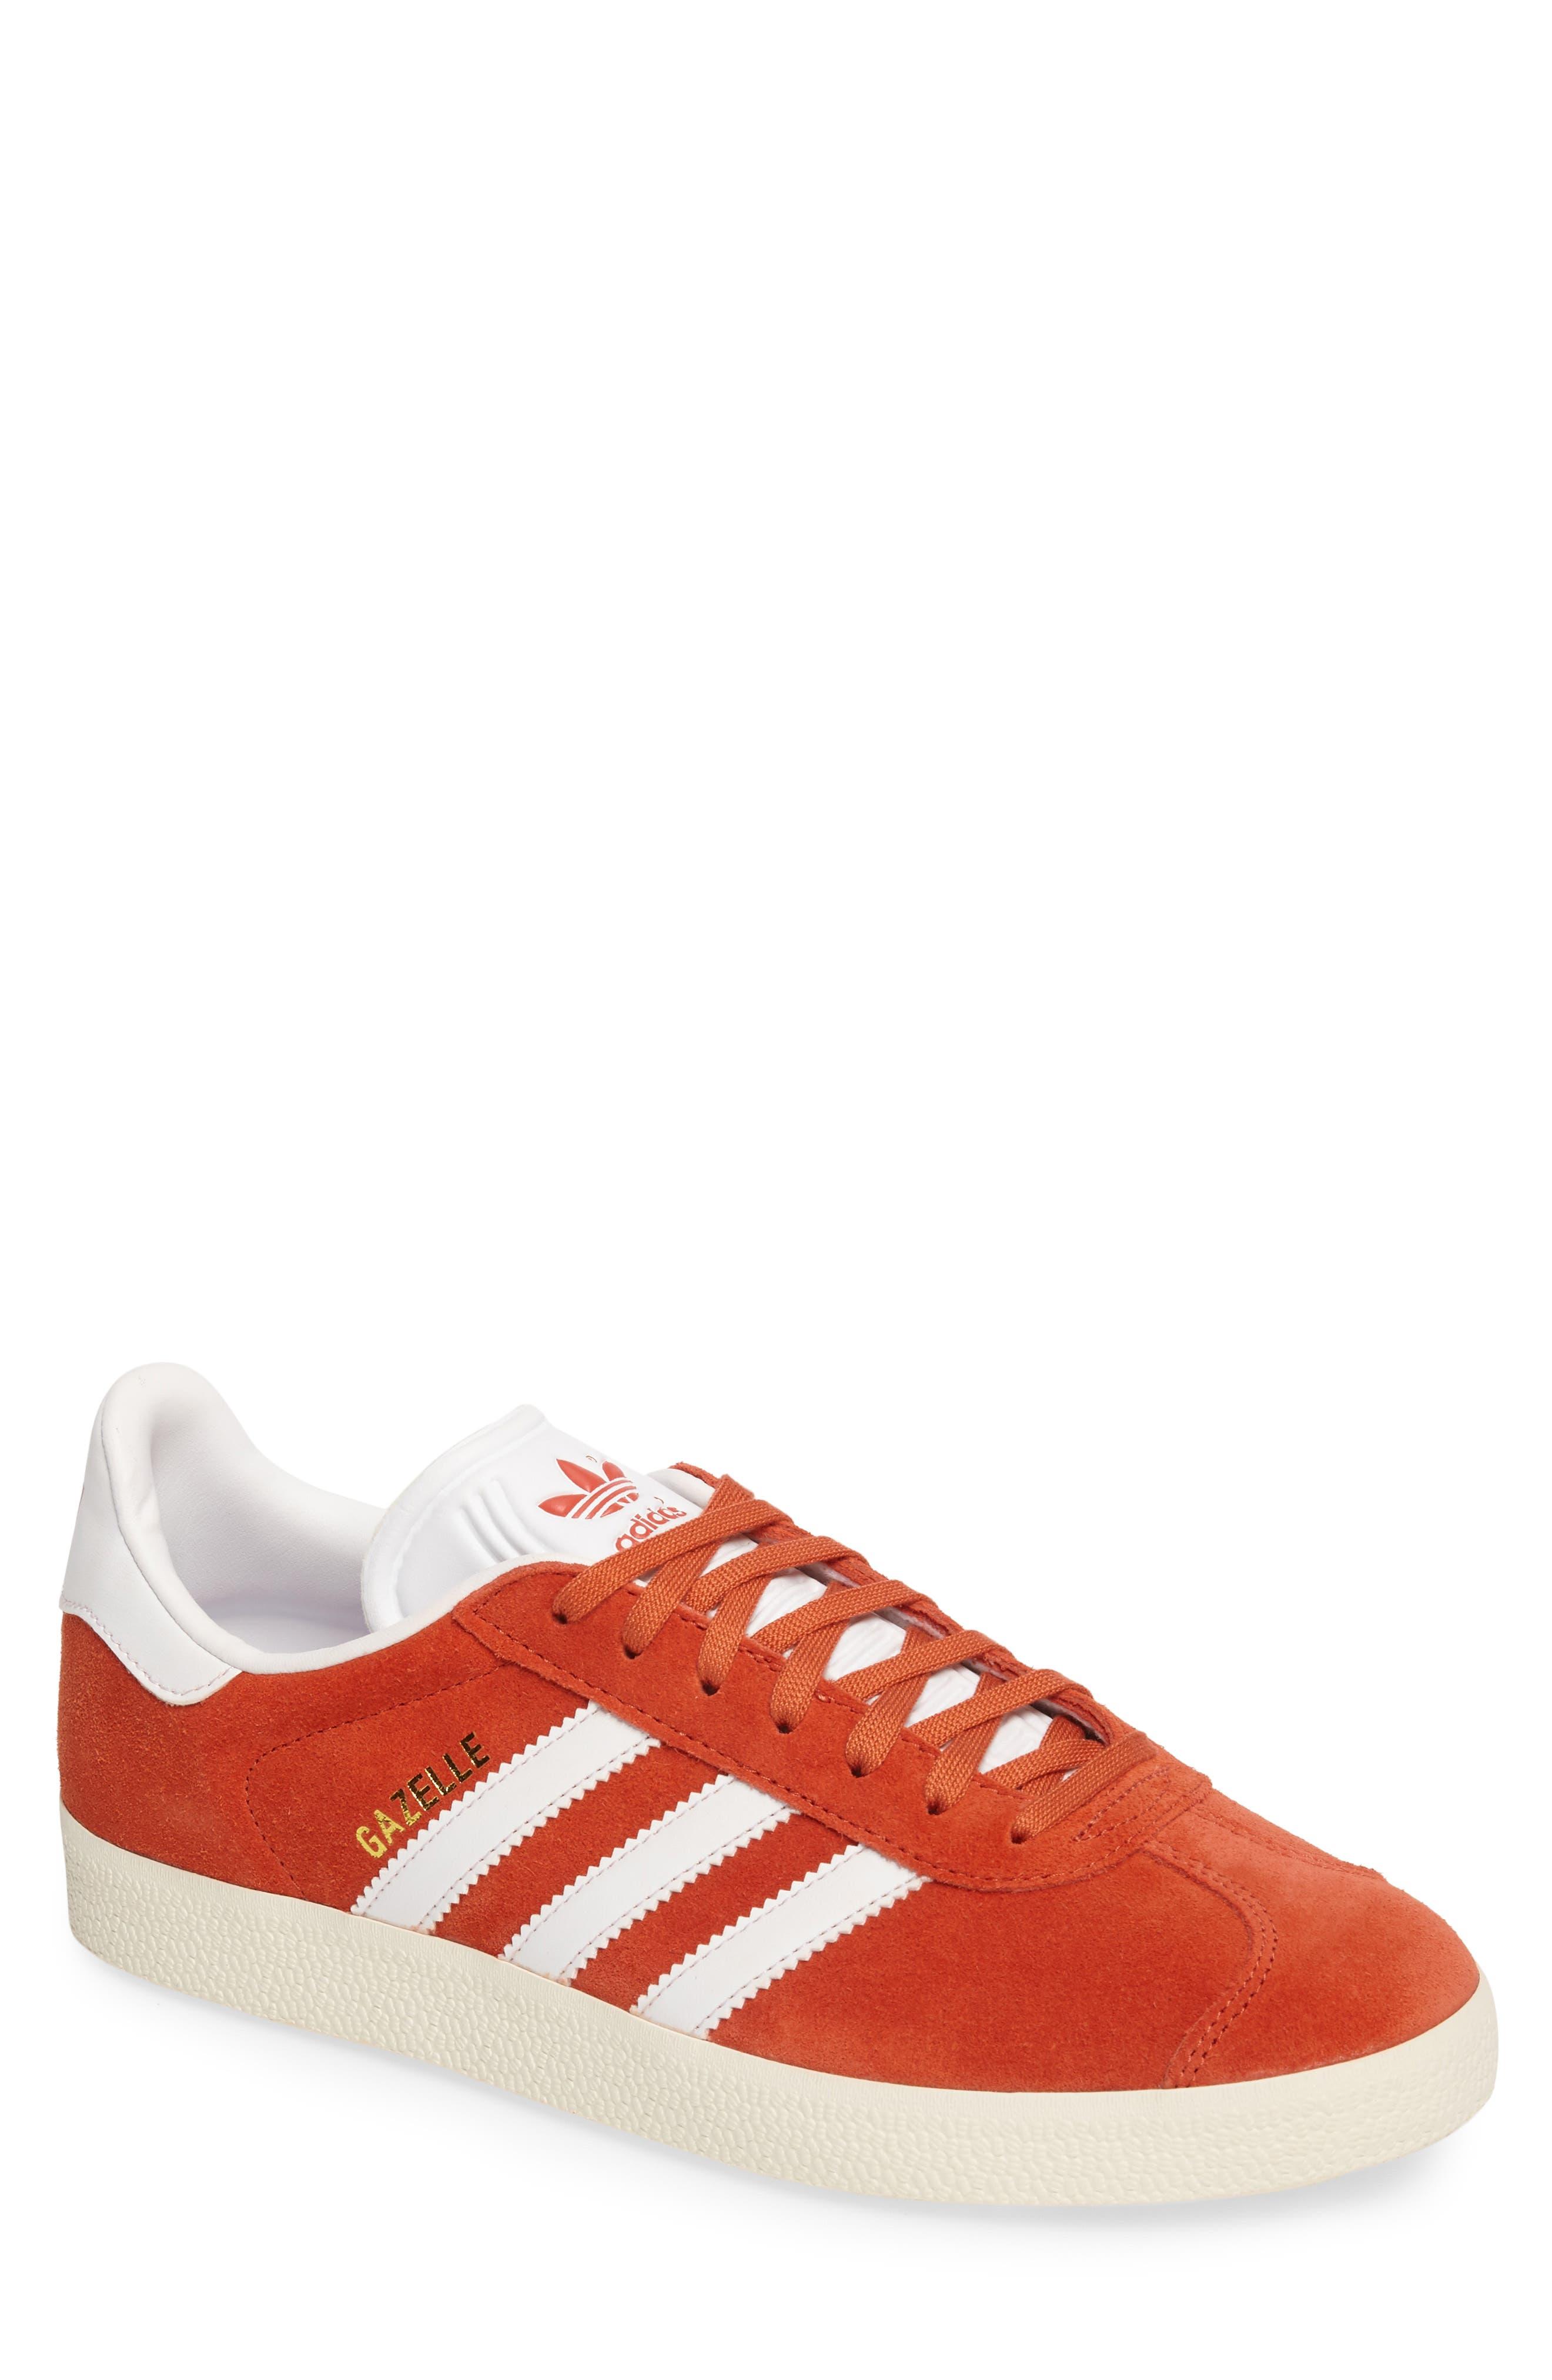 Main Image - adidas Gazelle Sneaker (Men)